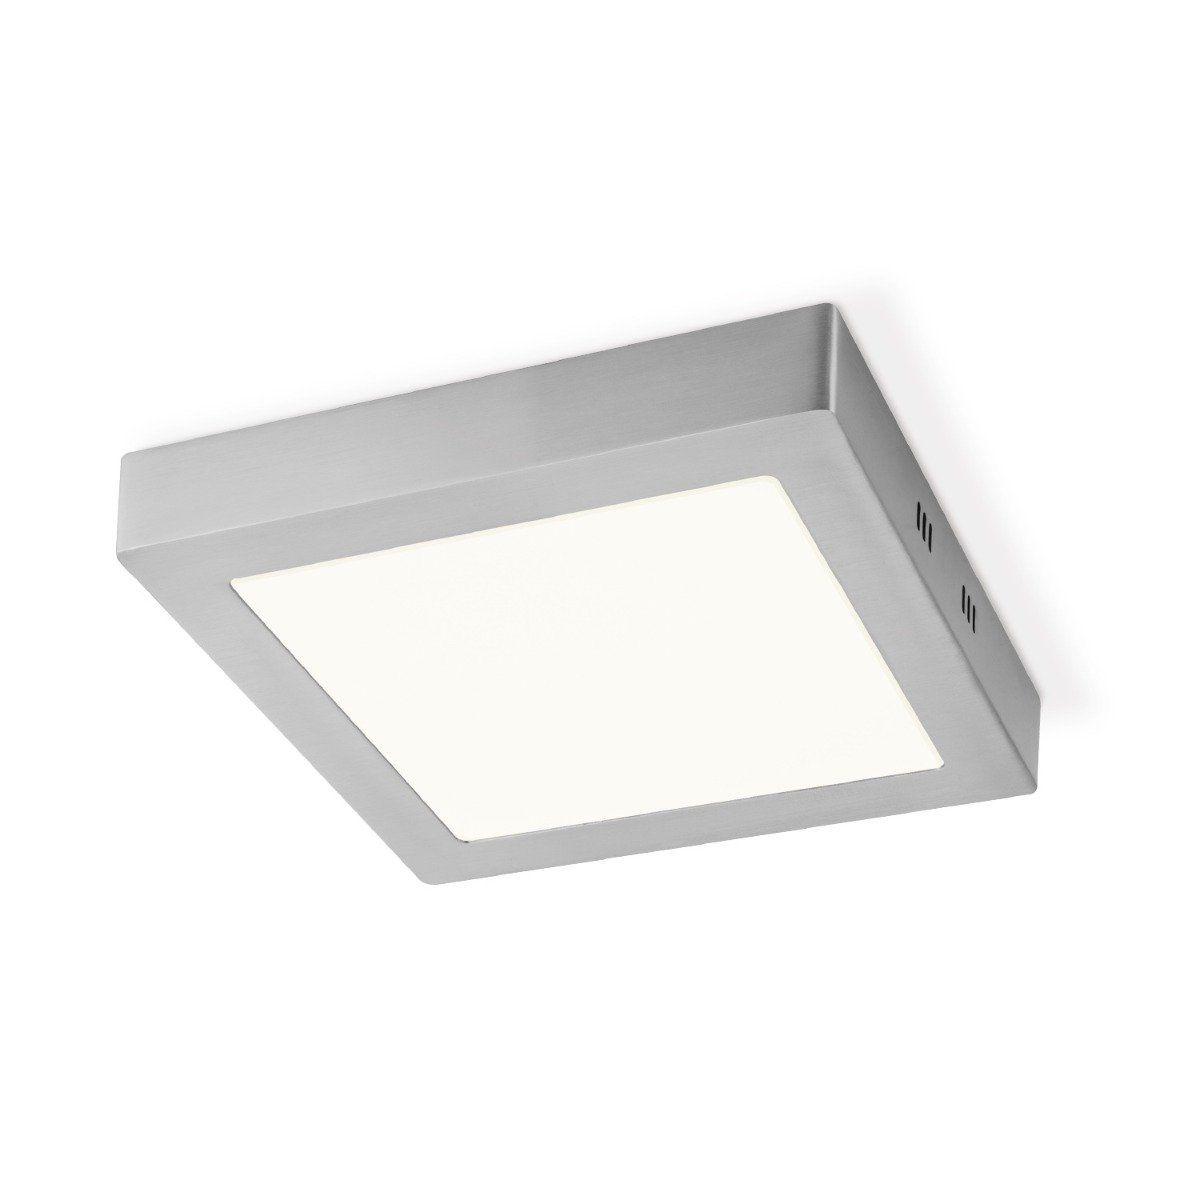 Home sweet home LED plafondlamp Ska vierkant 22,5 - mat staal